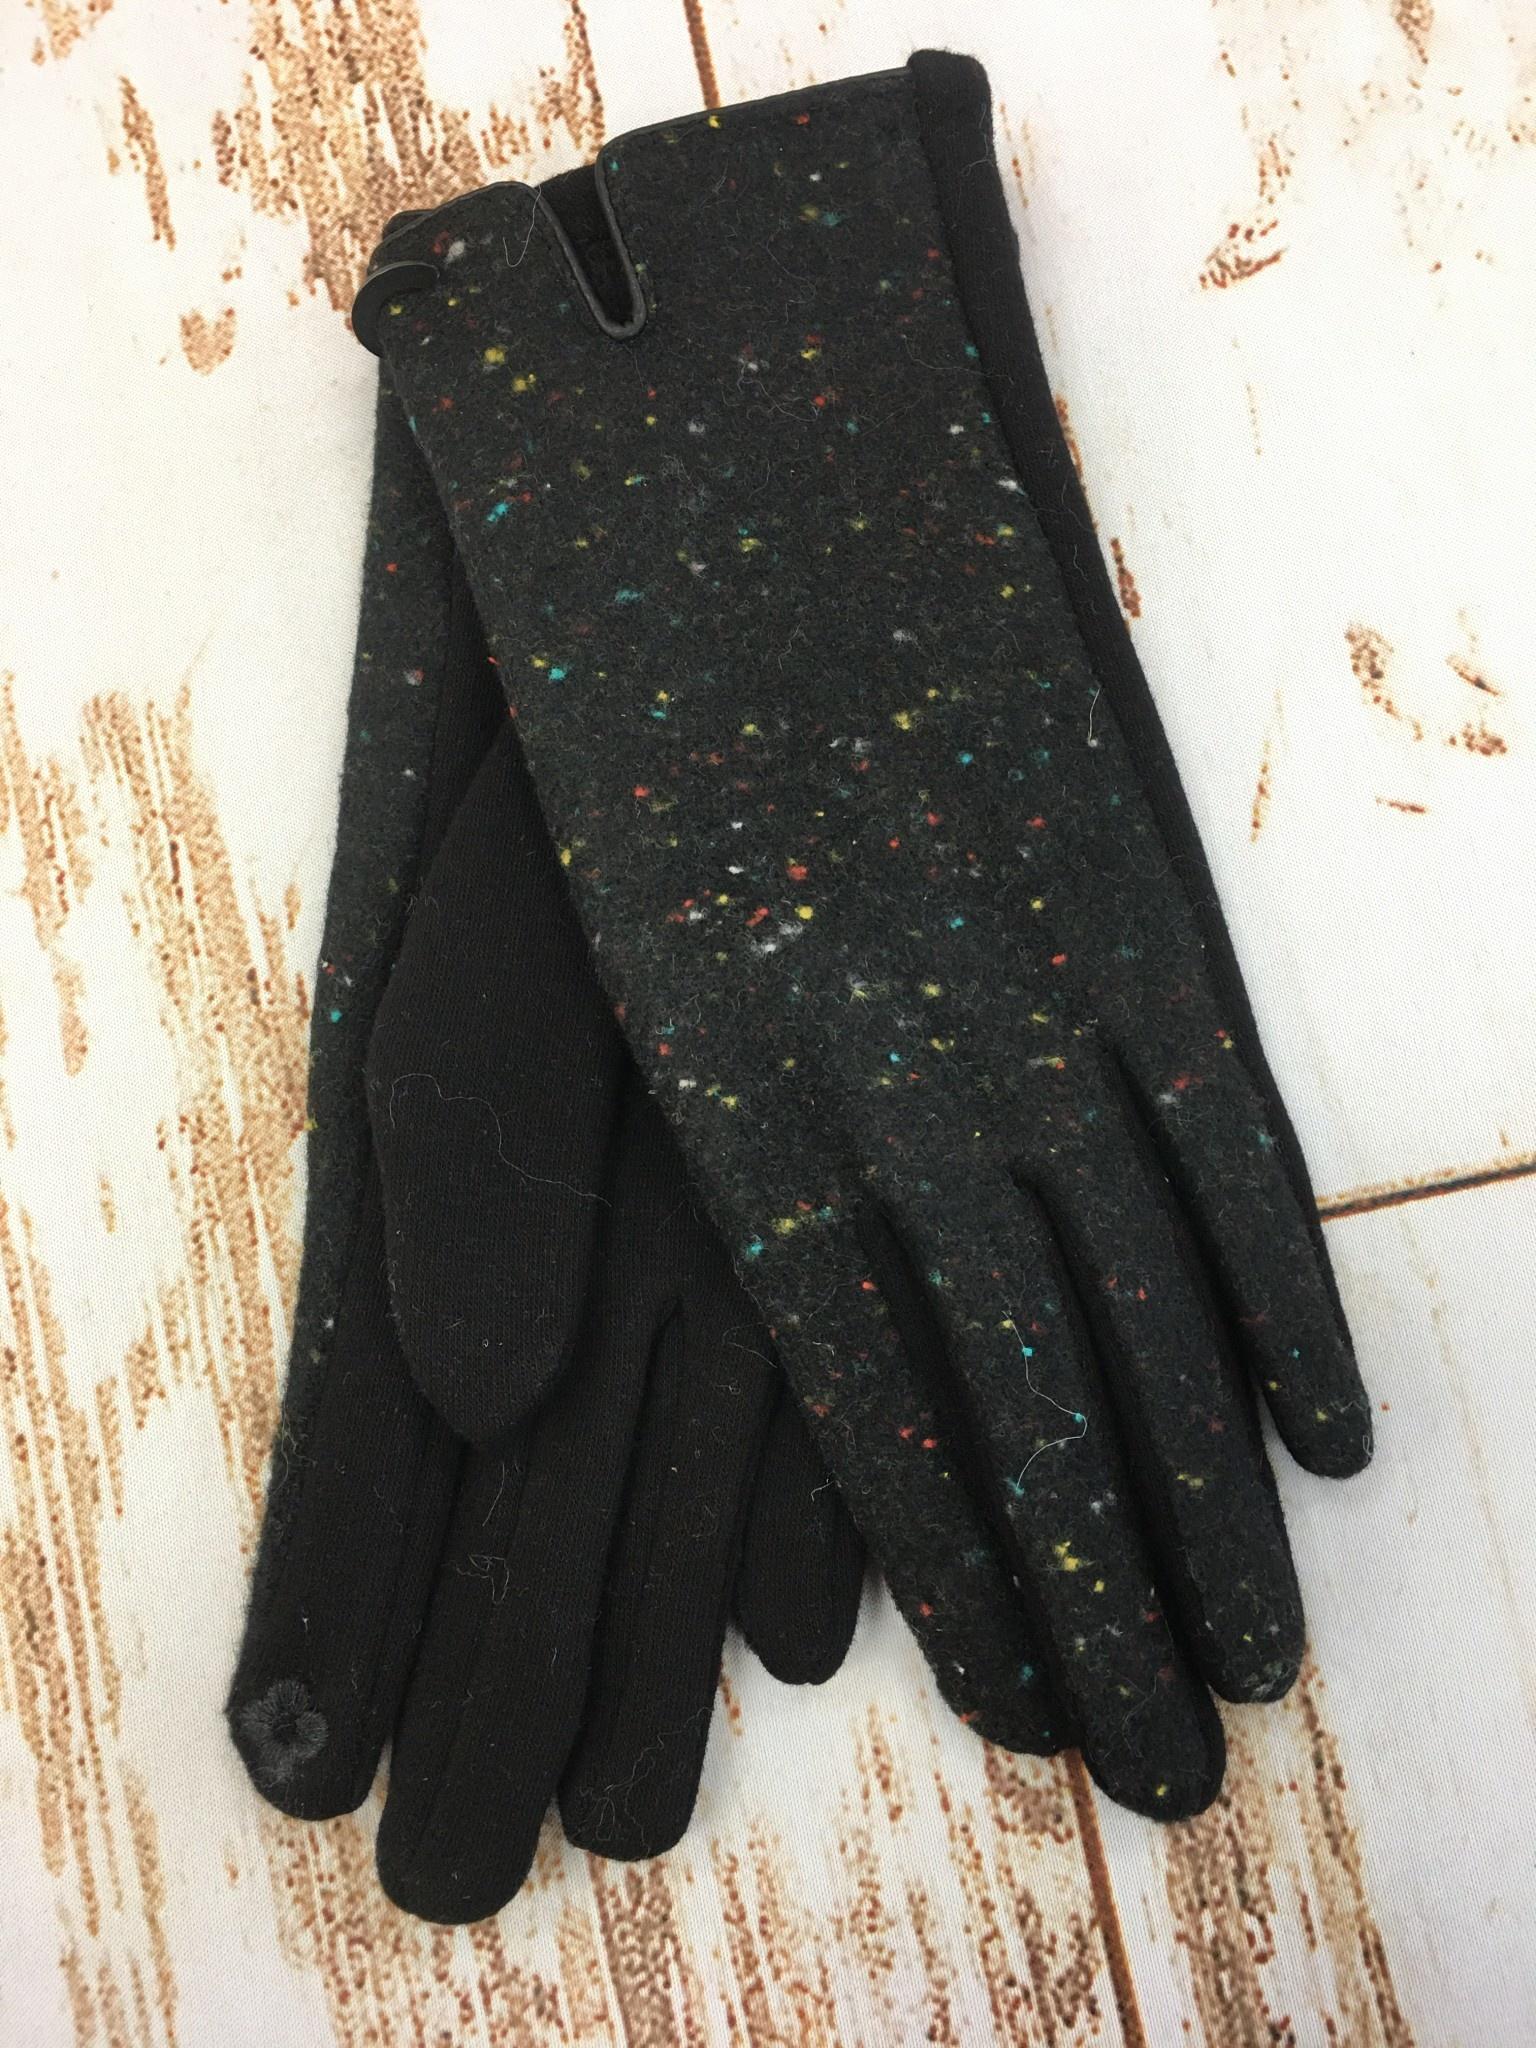 Accessories Now Speckle Glove